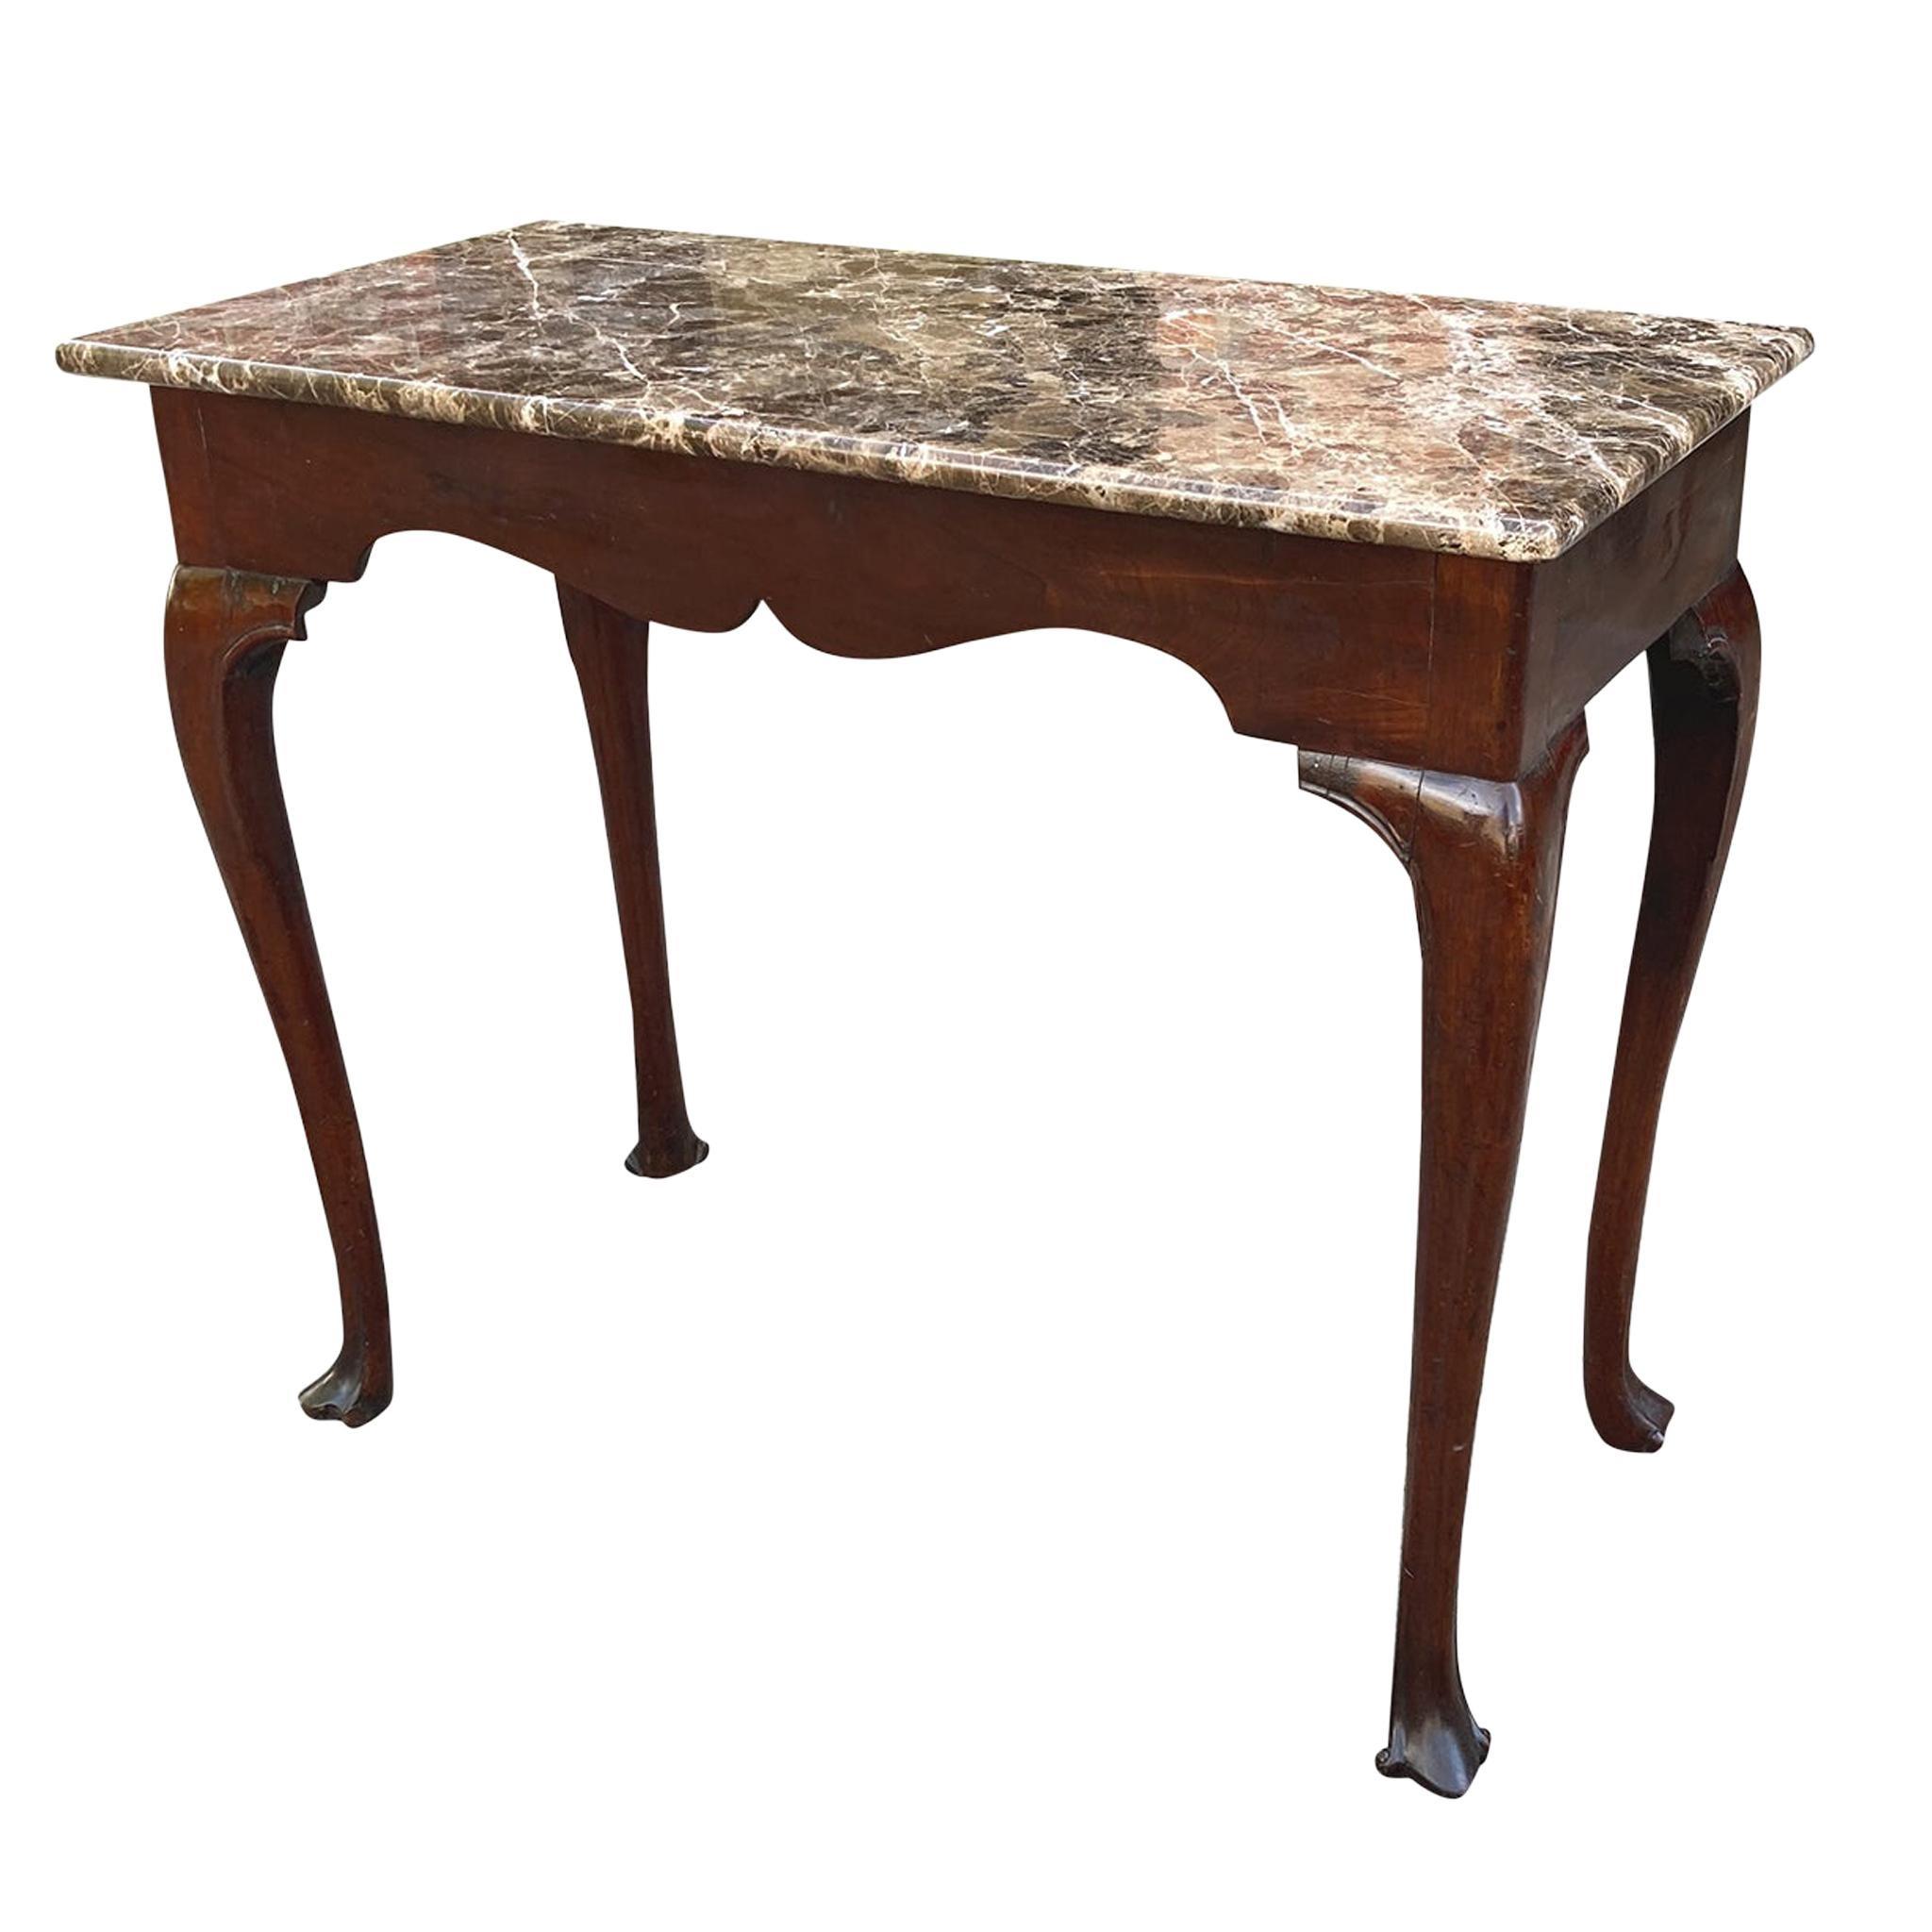 18th Century Irish Marble-Top Console Table